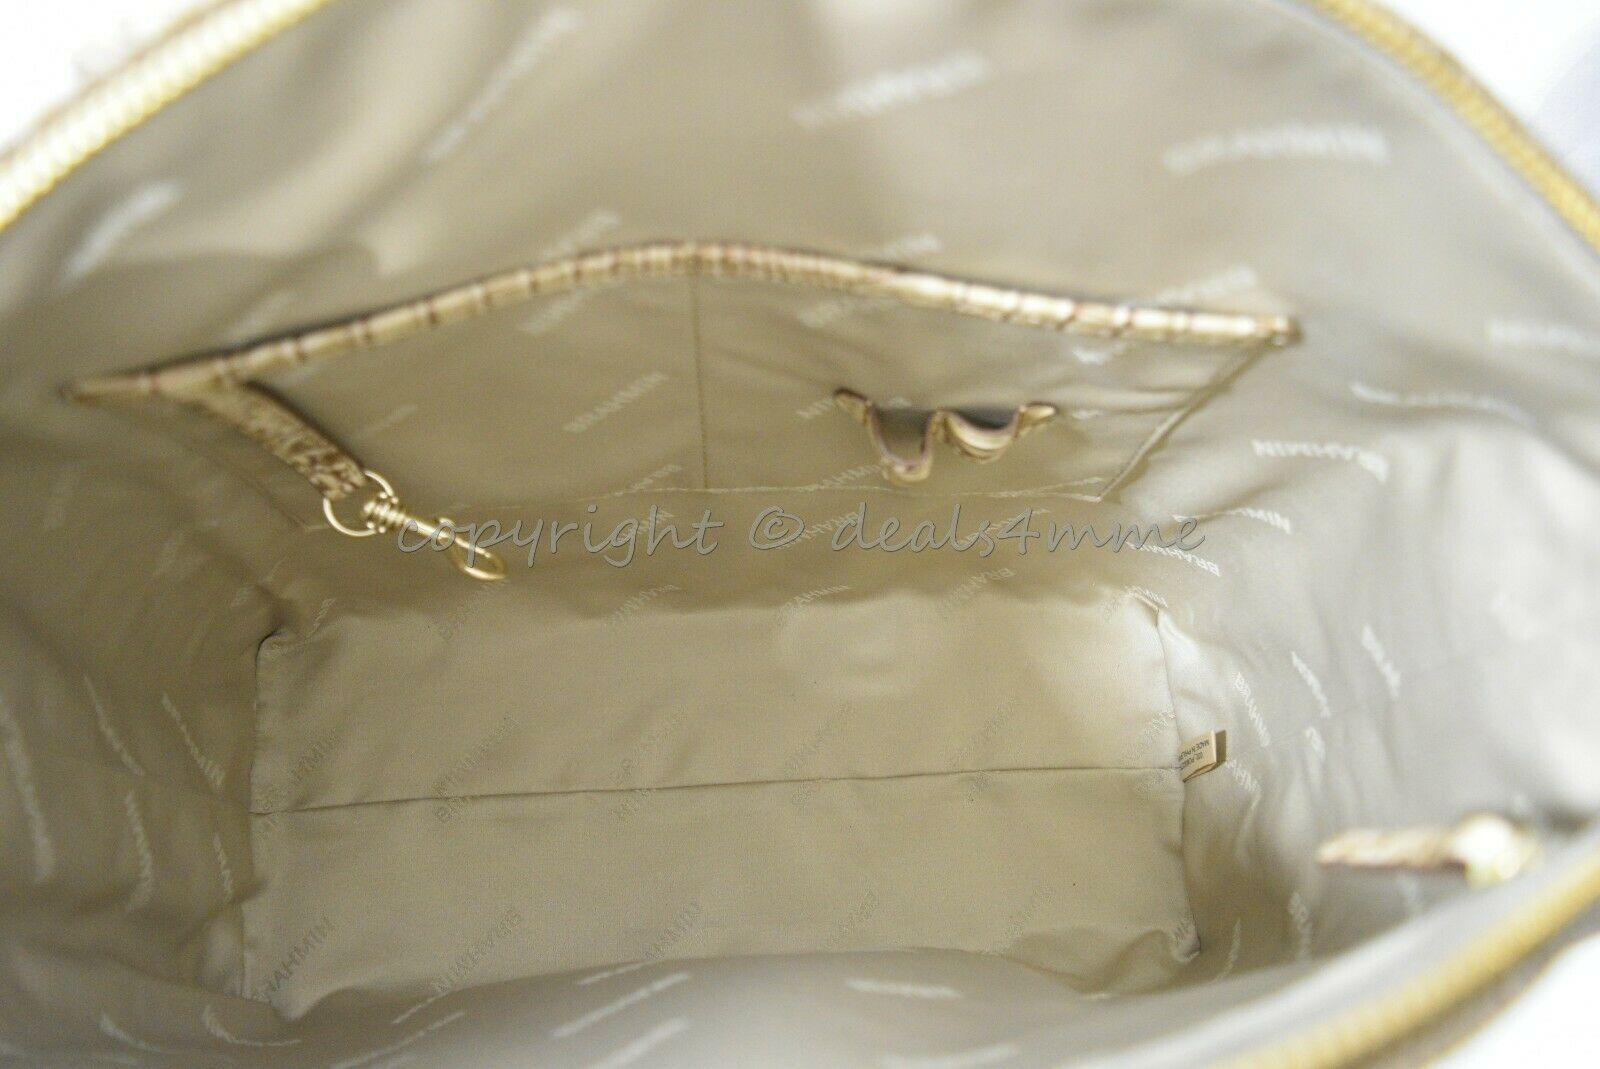 NWT Brahmin Large Duxbury Satchel/Shoulder Bag in Candy Apple Carlisle image 5